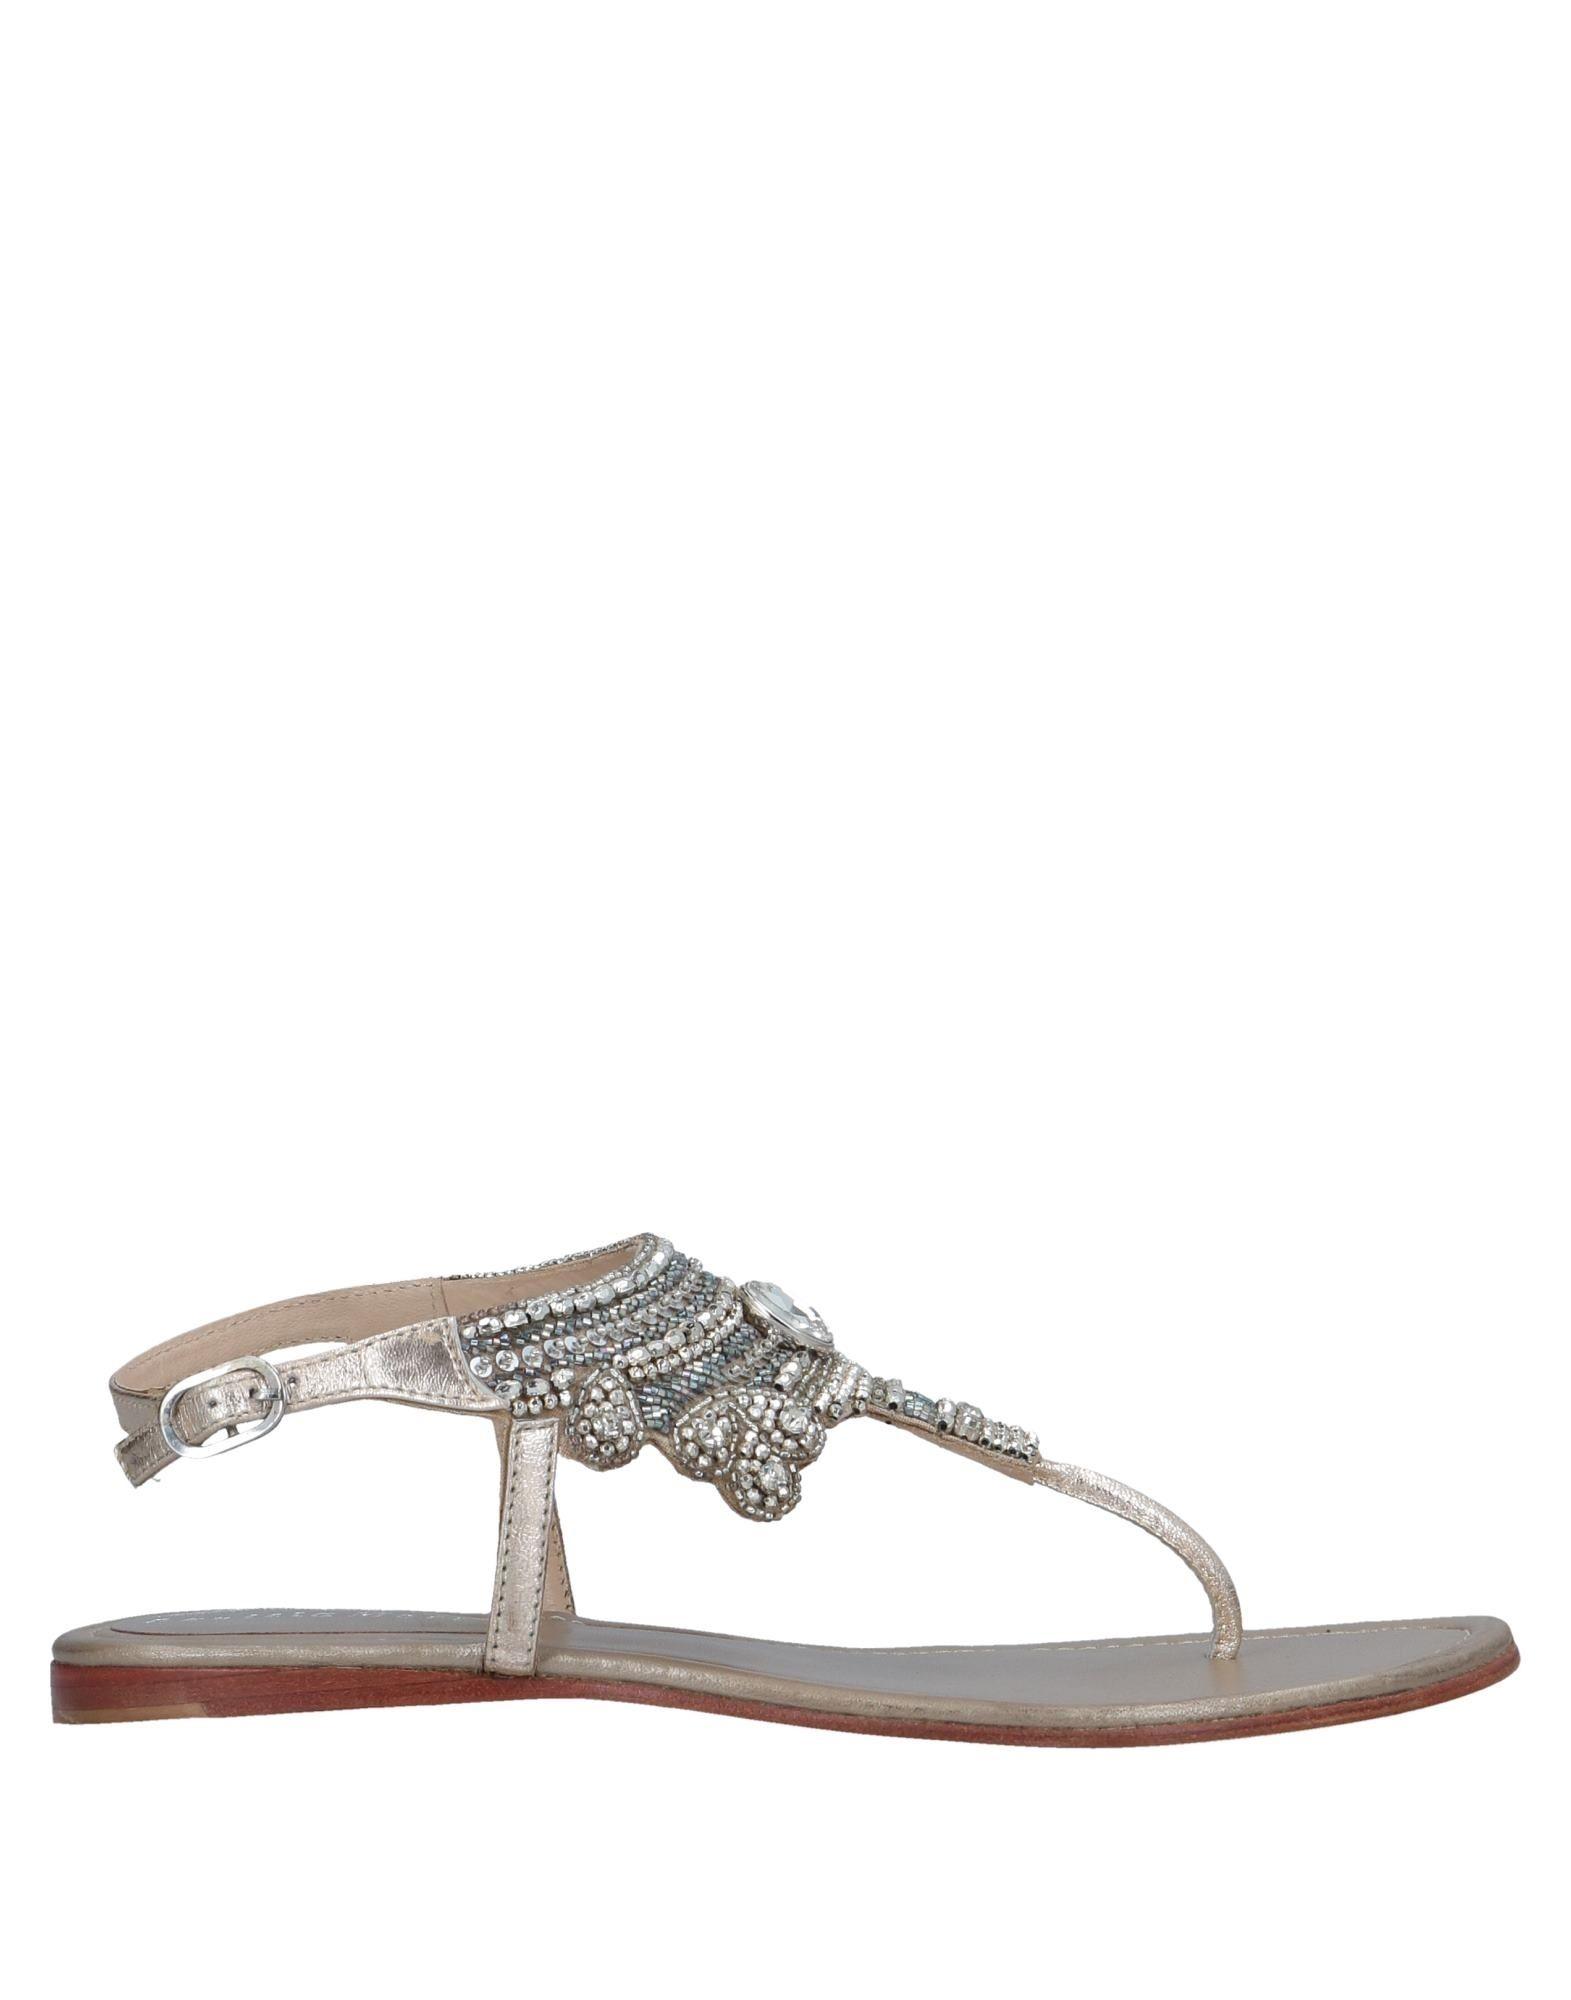 Daniela Mori Milano Dianetten Damen  11525166SA Gute Qualität beliebte Schuhe